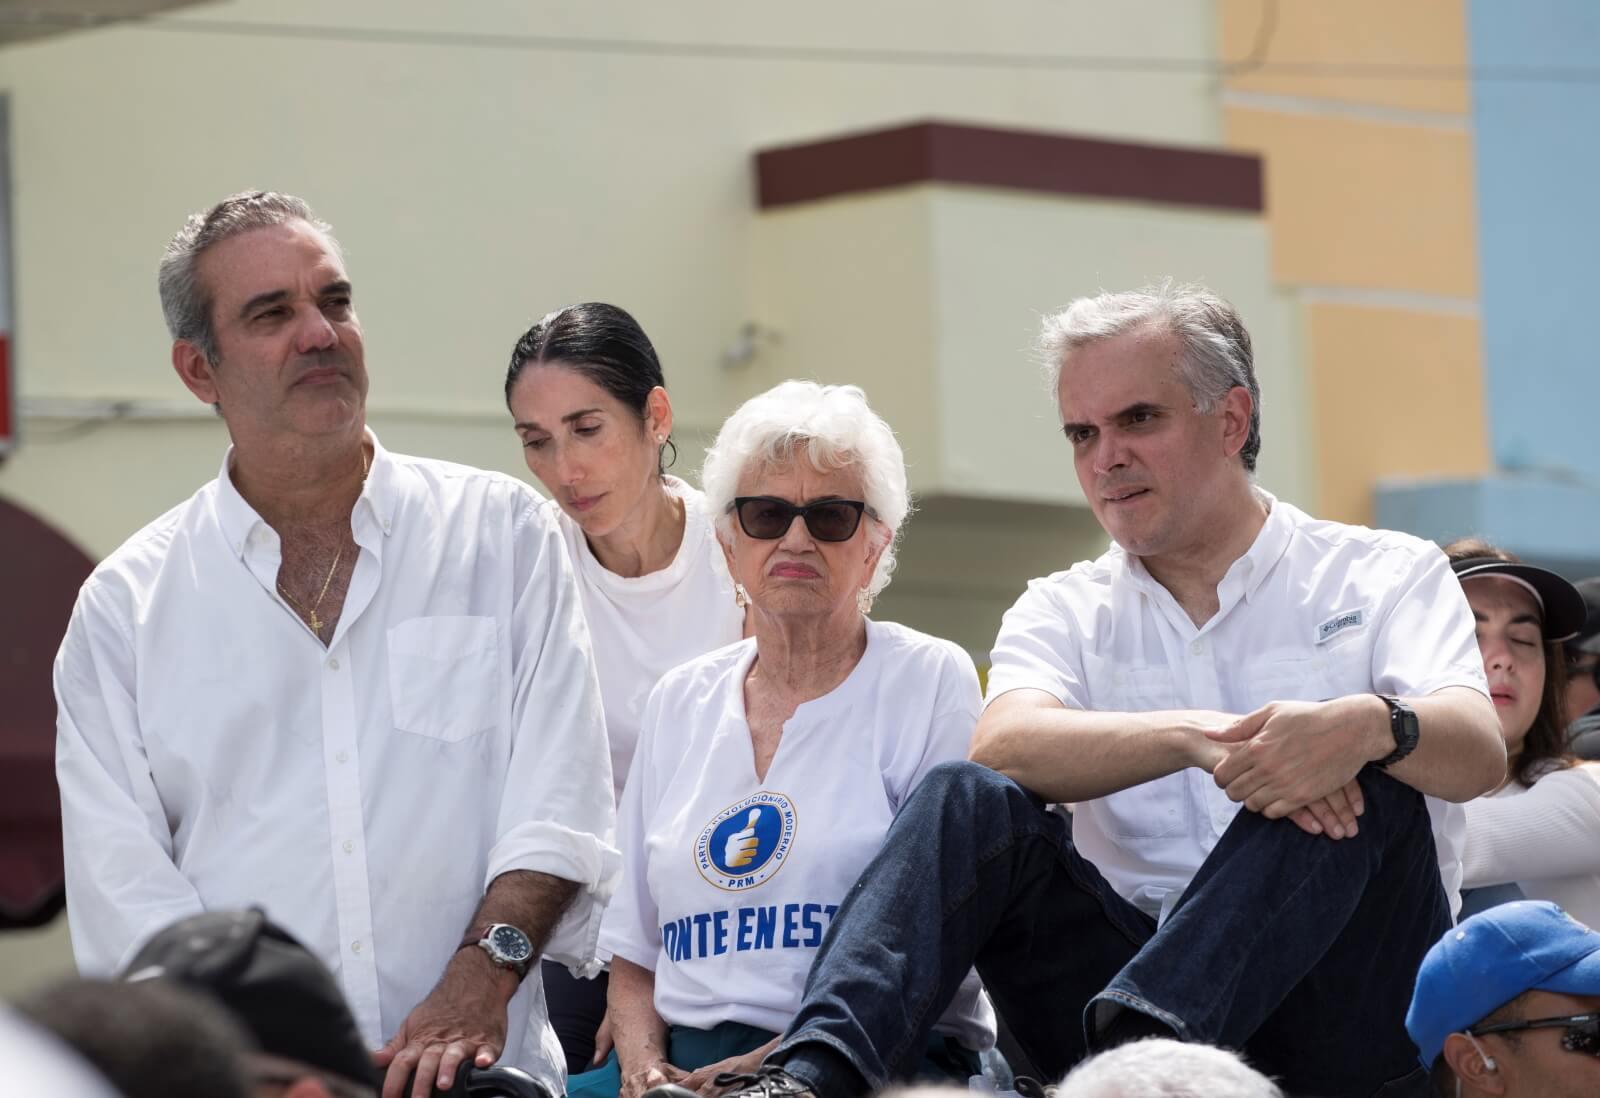 Wybory na Dominikanie fot. EPA/Orlando BarrĂa